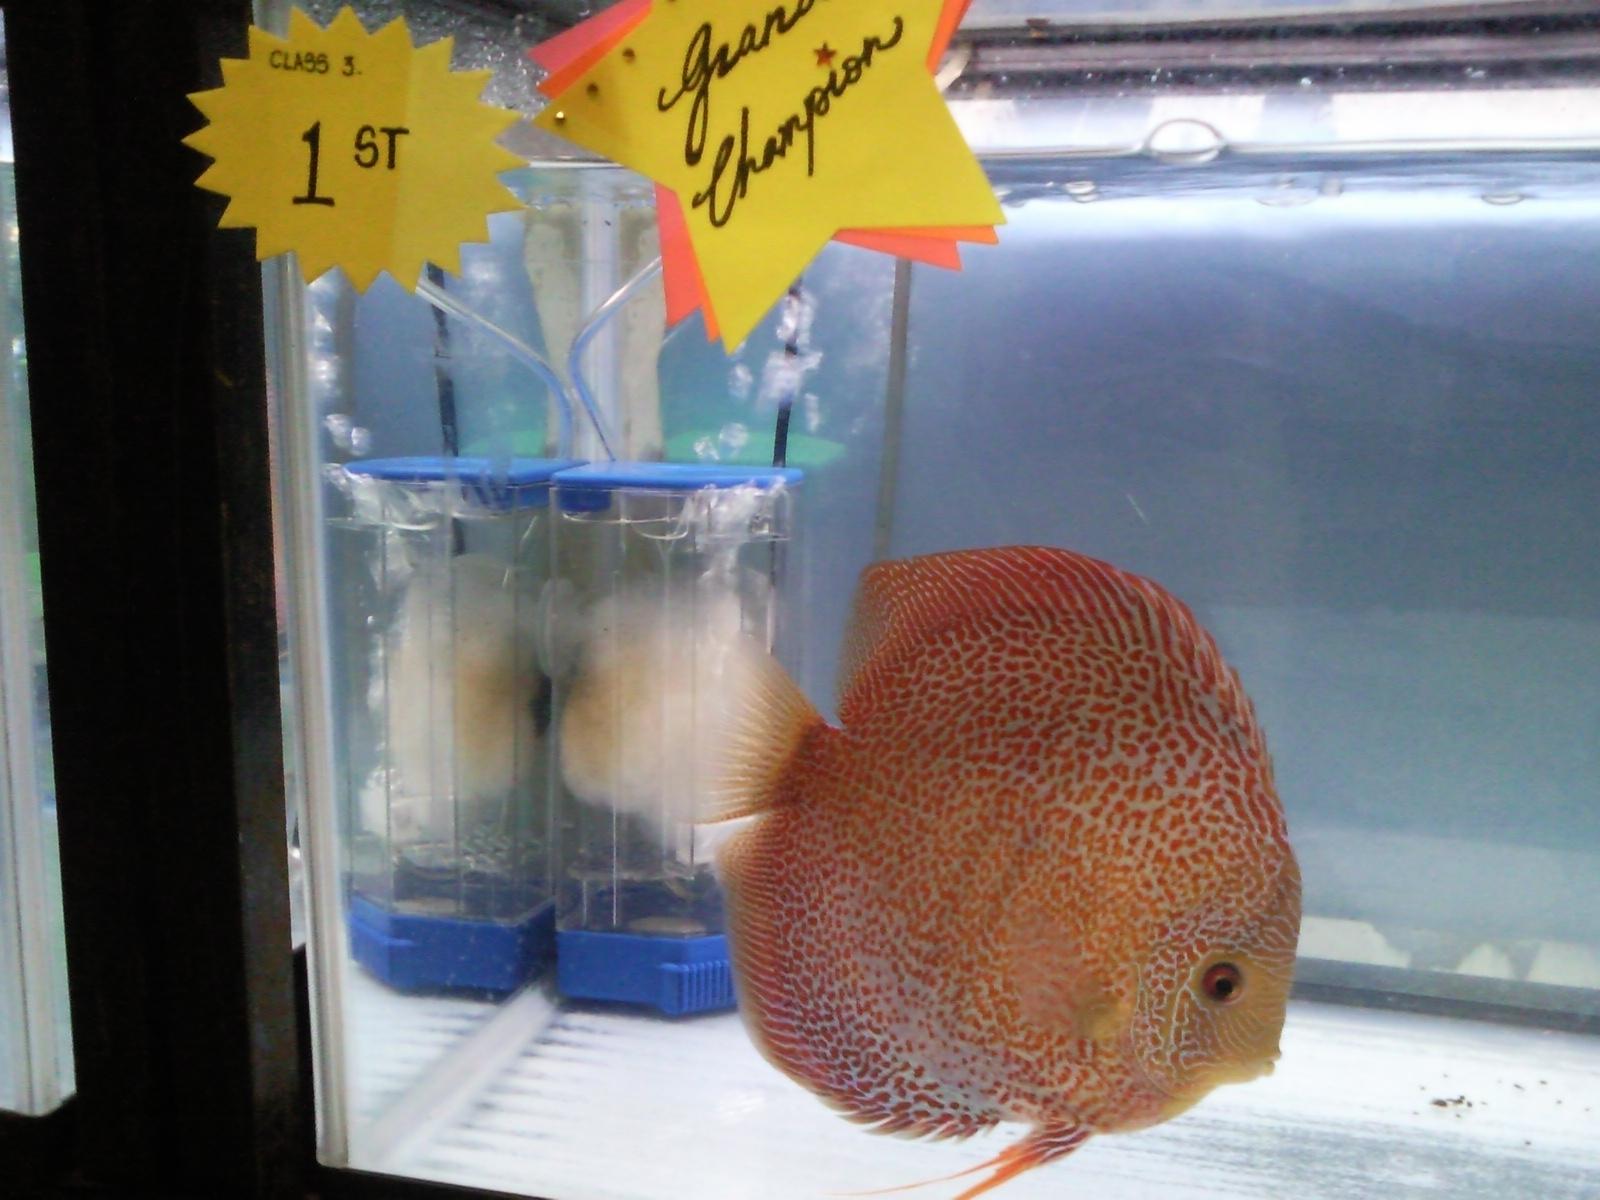 Tropical Fisher Man Fish Tanks And Aquarium CRS: Discus Club 12th ...